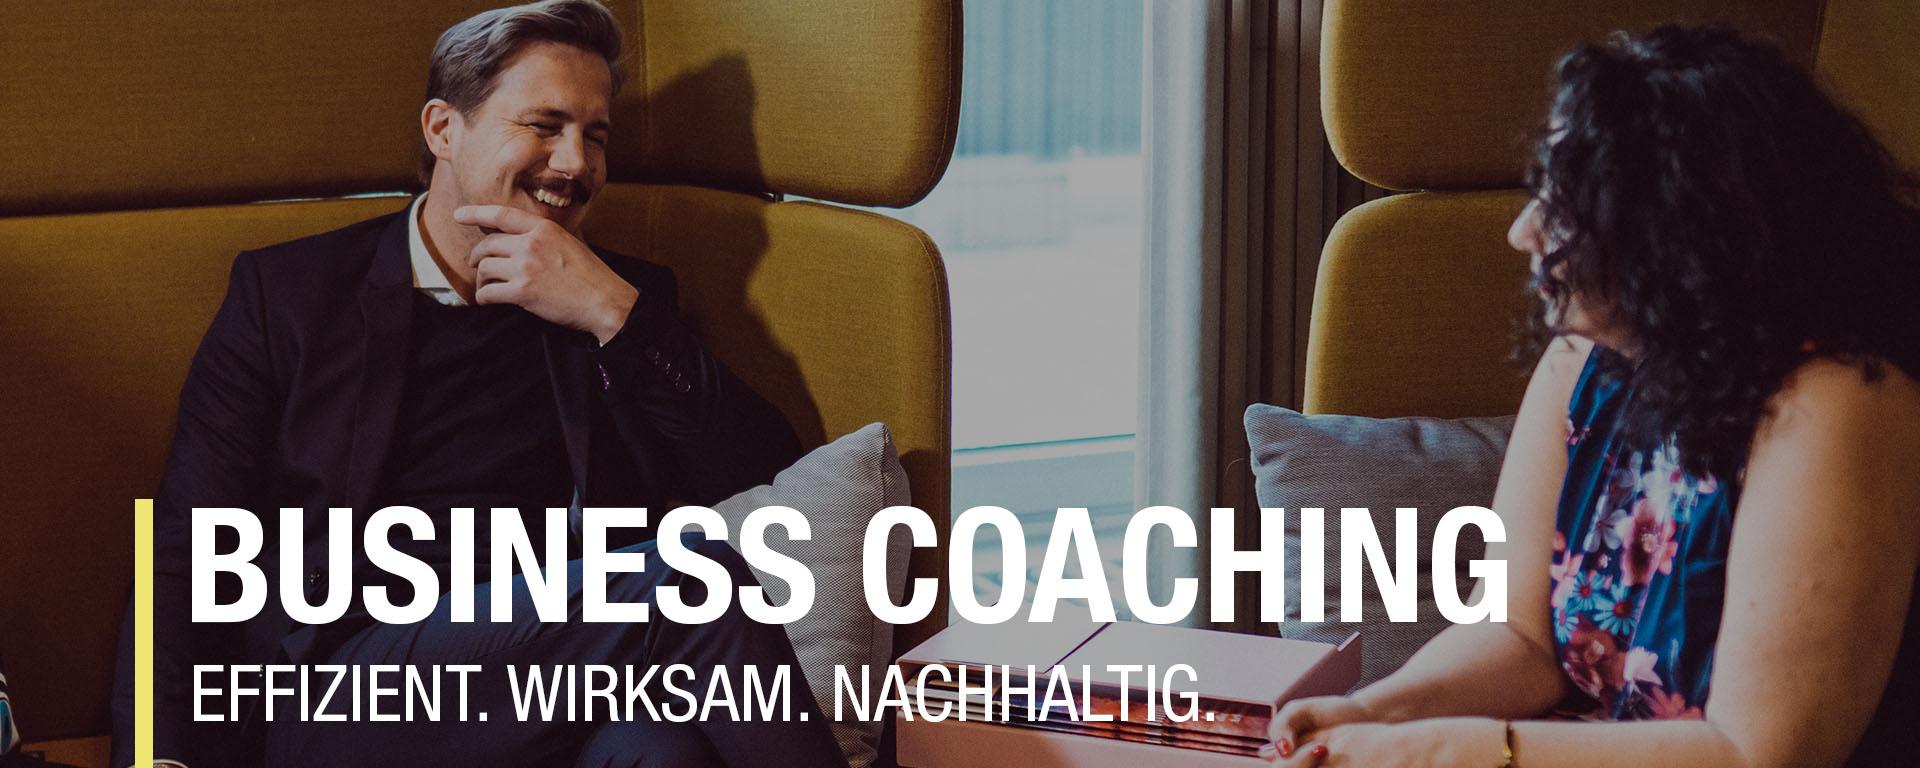 Online Coaching, Business Coaching, Leadership, Führungskräftetraining